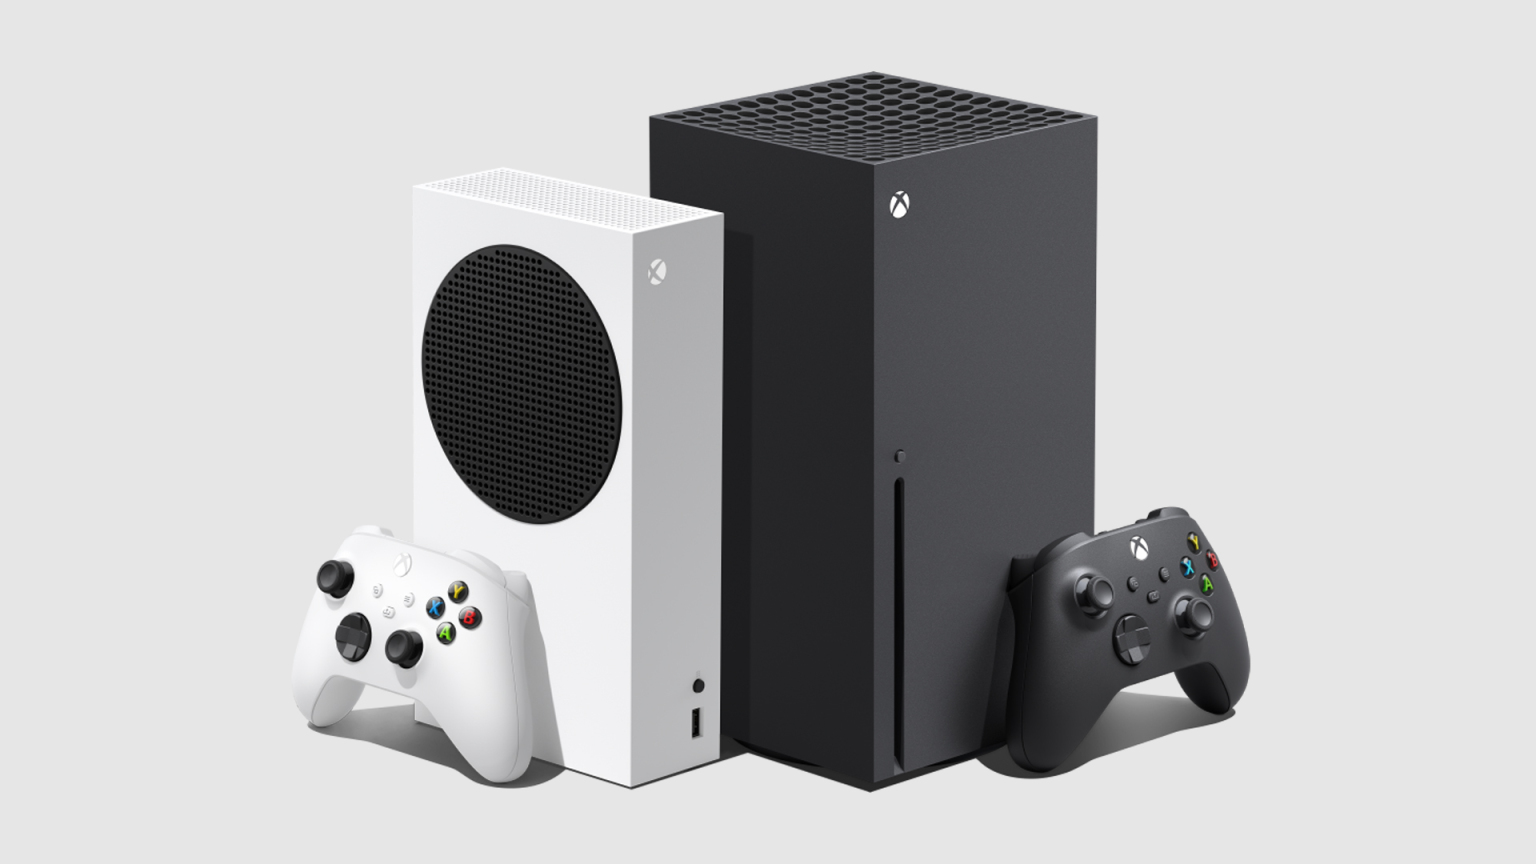 Xbox Series X|S ألعاب إطلاق